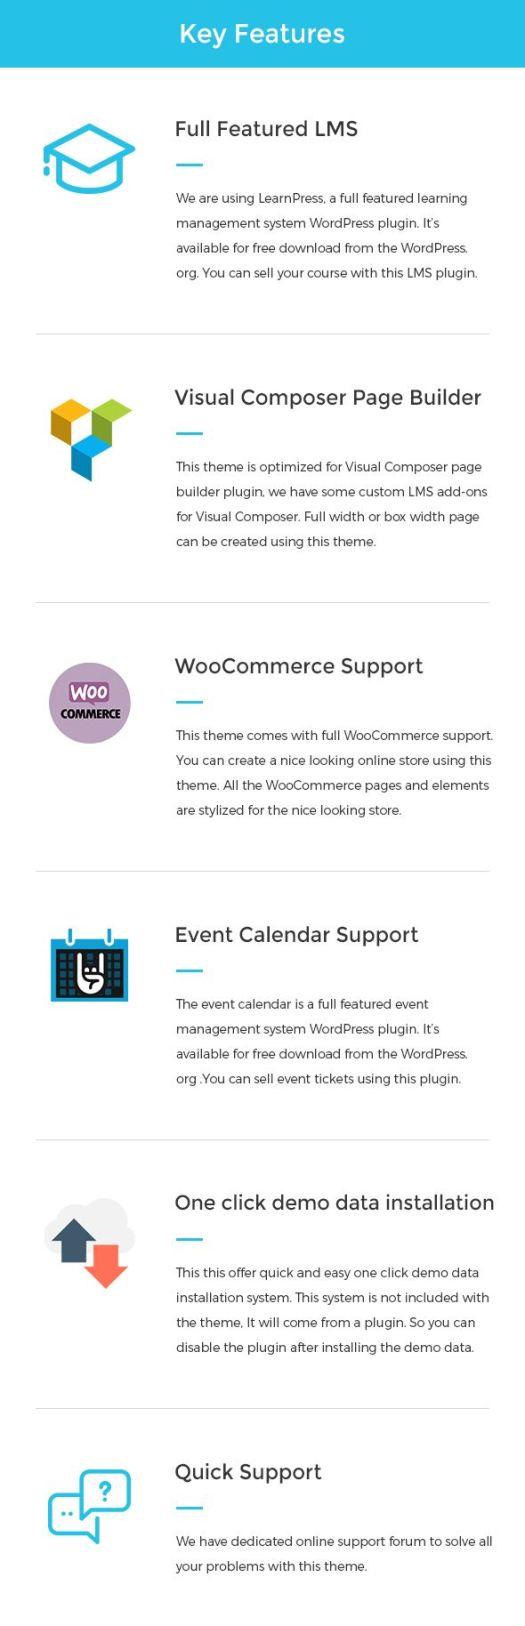 WP Education – The Ultimate WordPress LMS Theme